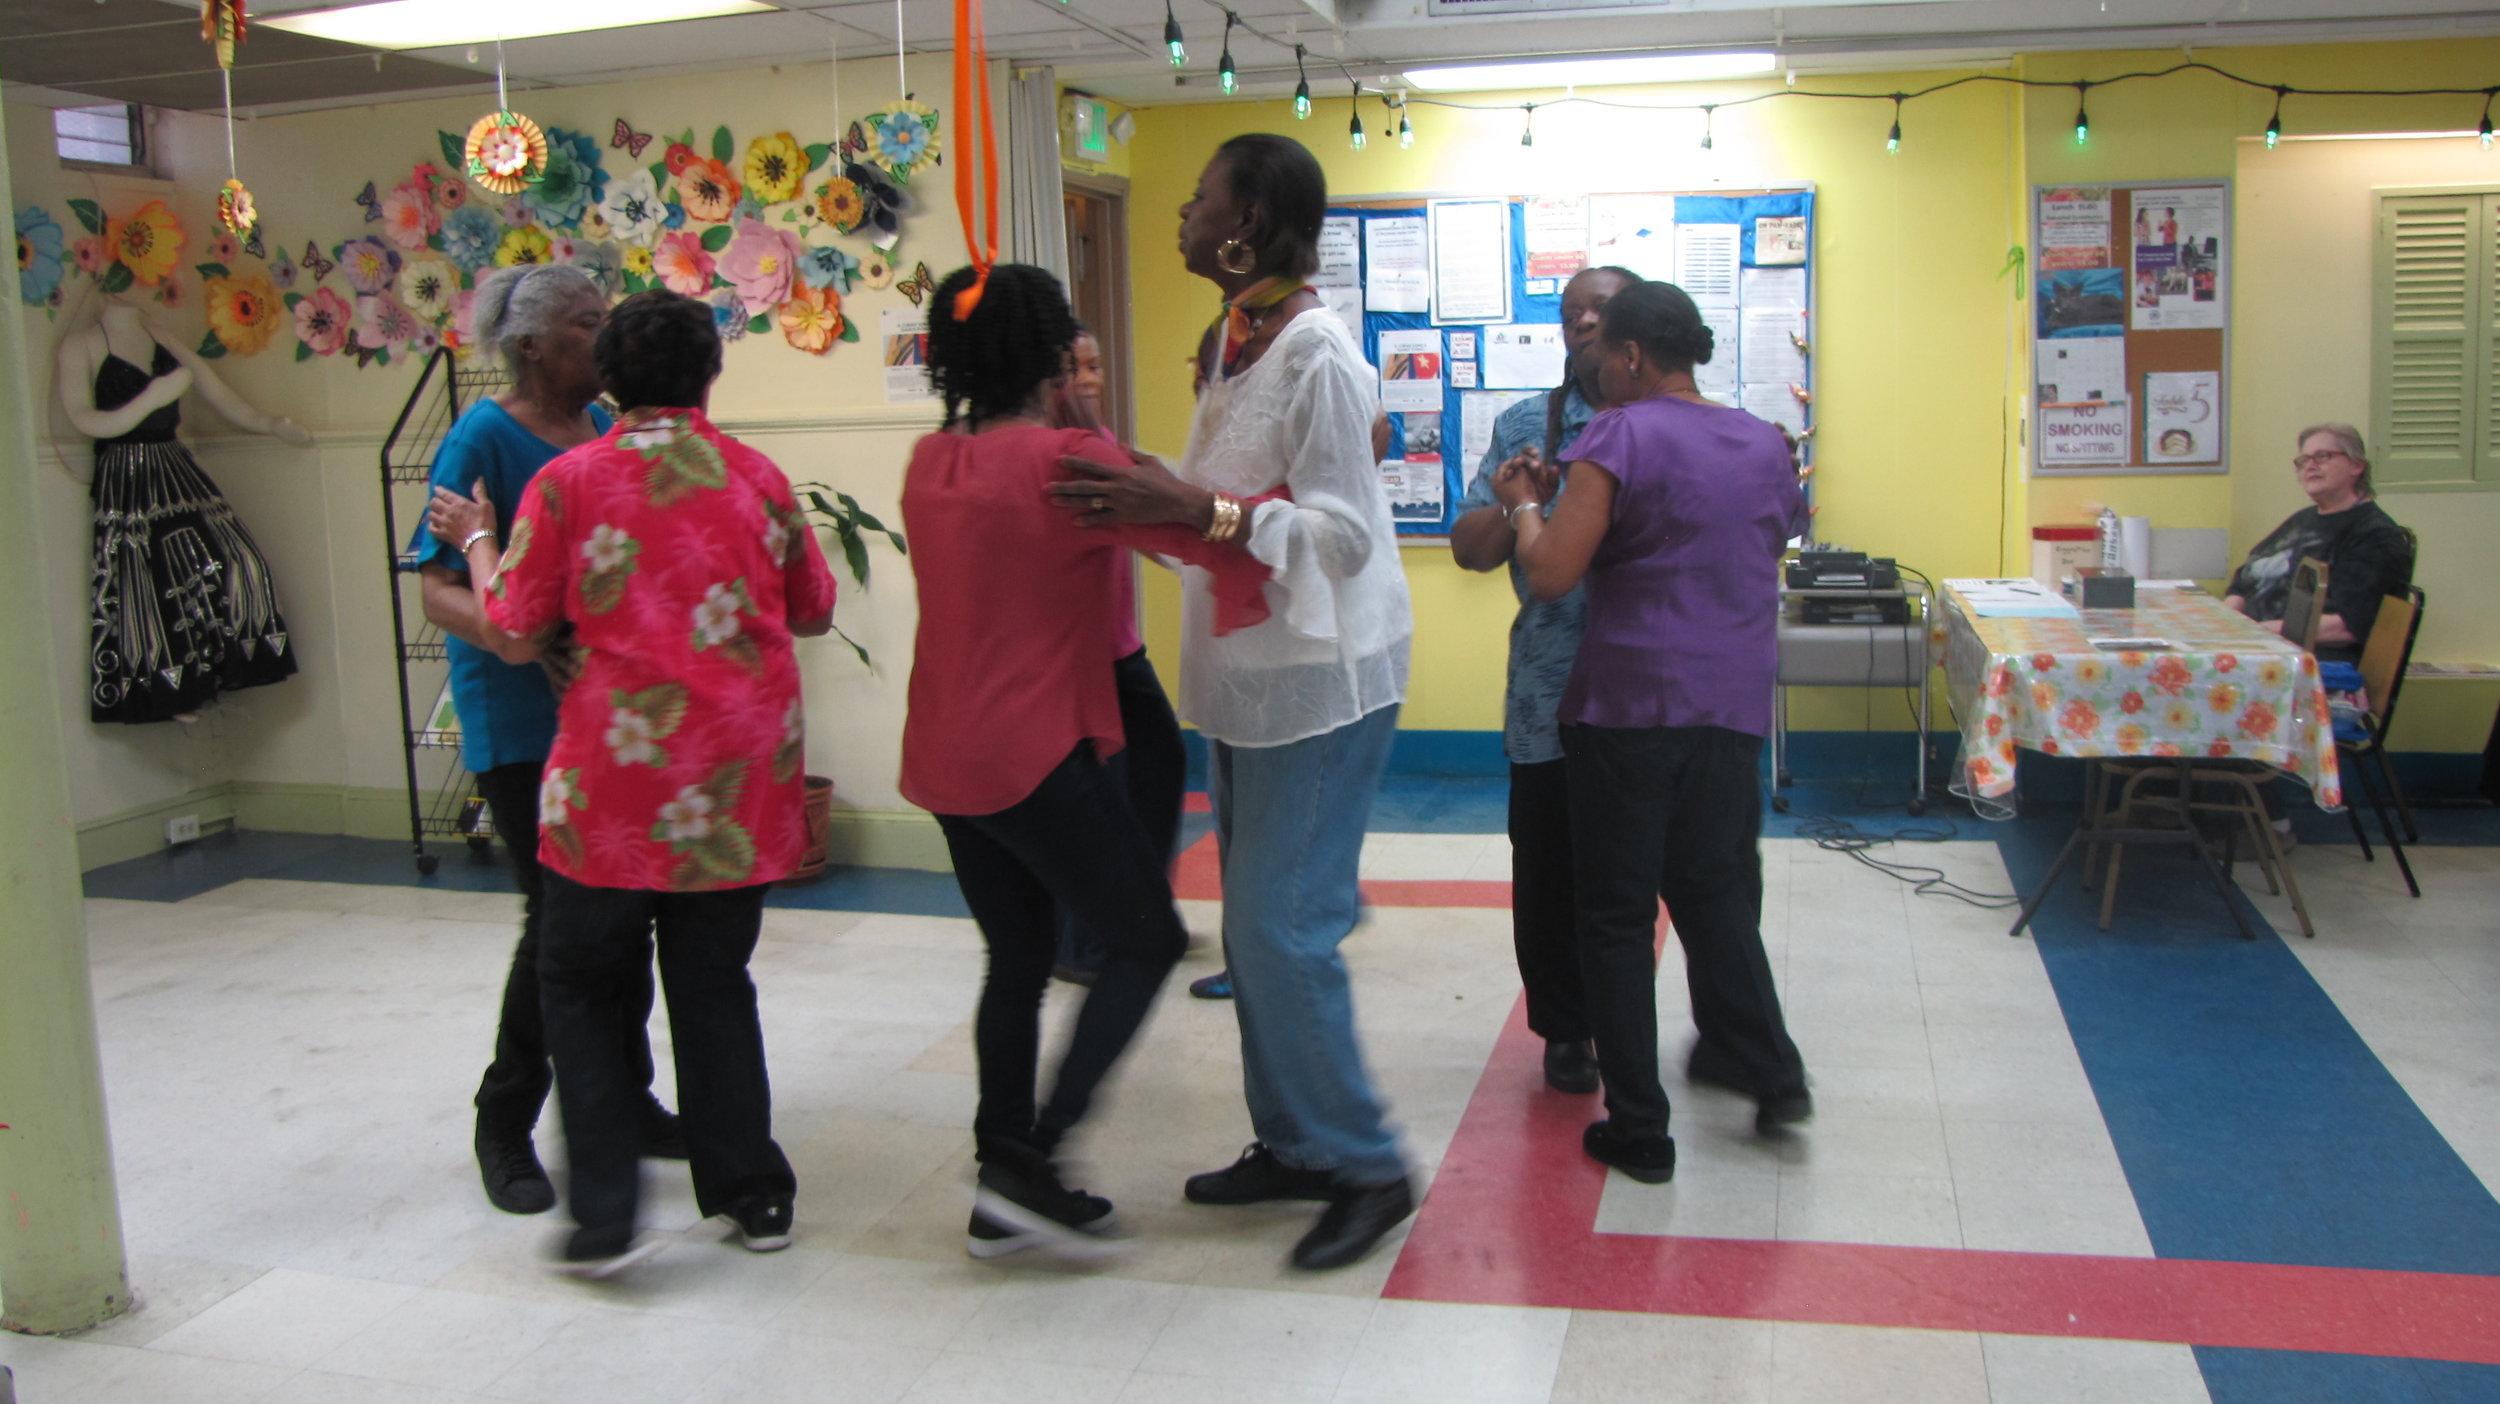 Members of the Remsen Neighborhood Senior Center demonstrate Cuban rueda de casino at the Dorchester Senior Citizen's Center.